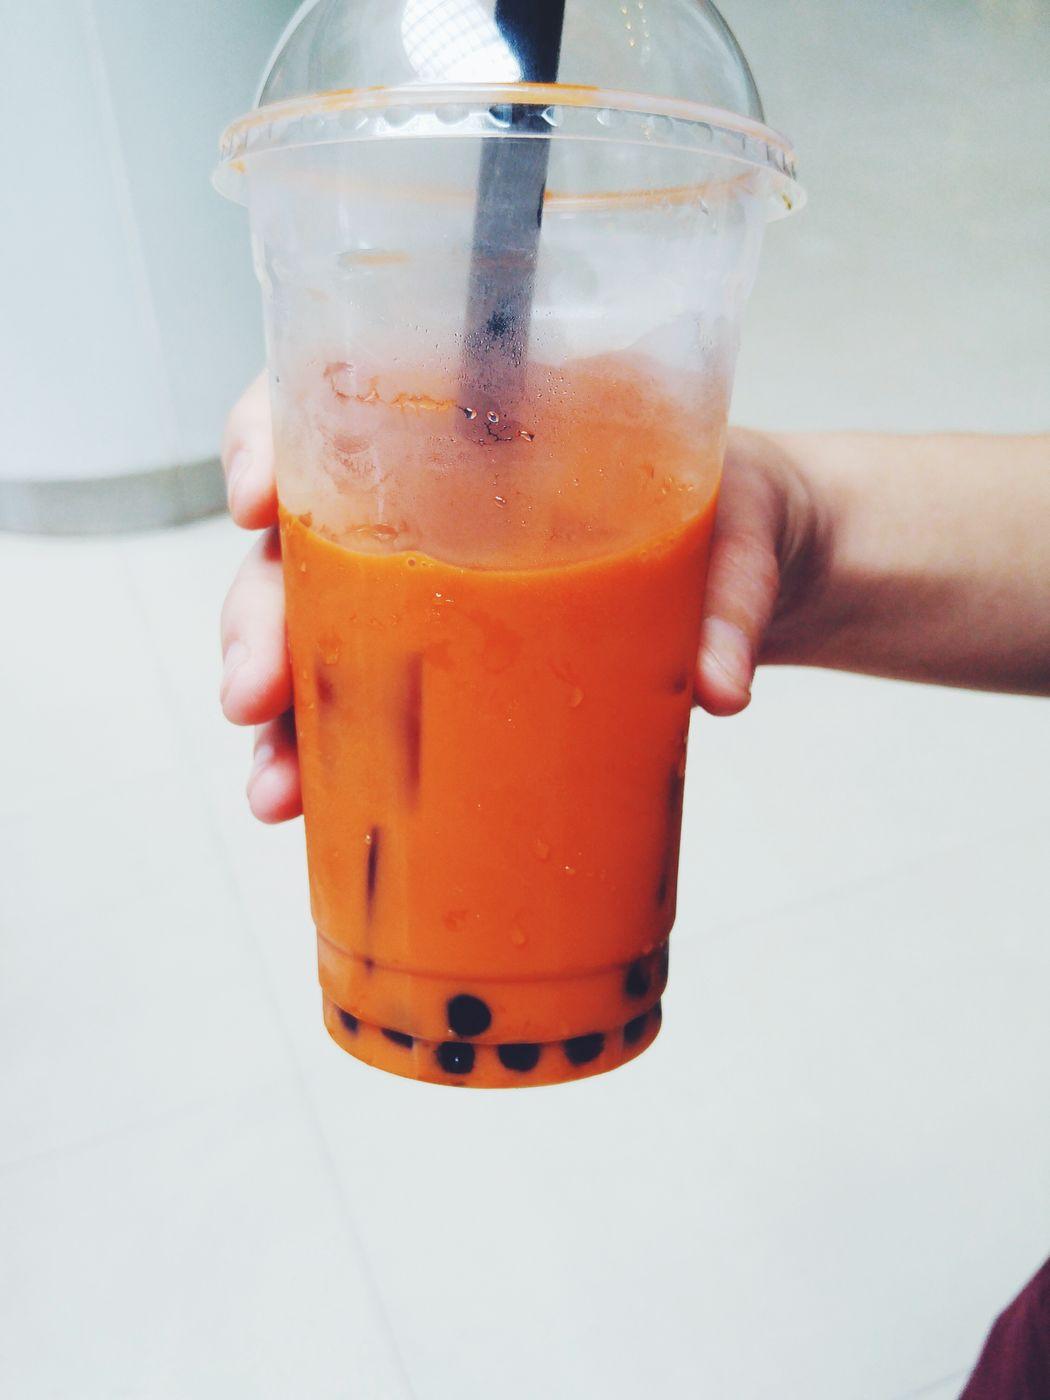 Liquid Lunch Thai Milk Tea Pearls Tea Drink Sweet Plastic Hot Day Cold Drink Some thai milk tea for a warm day Cha Yen